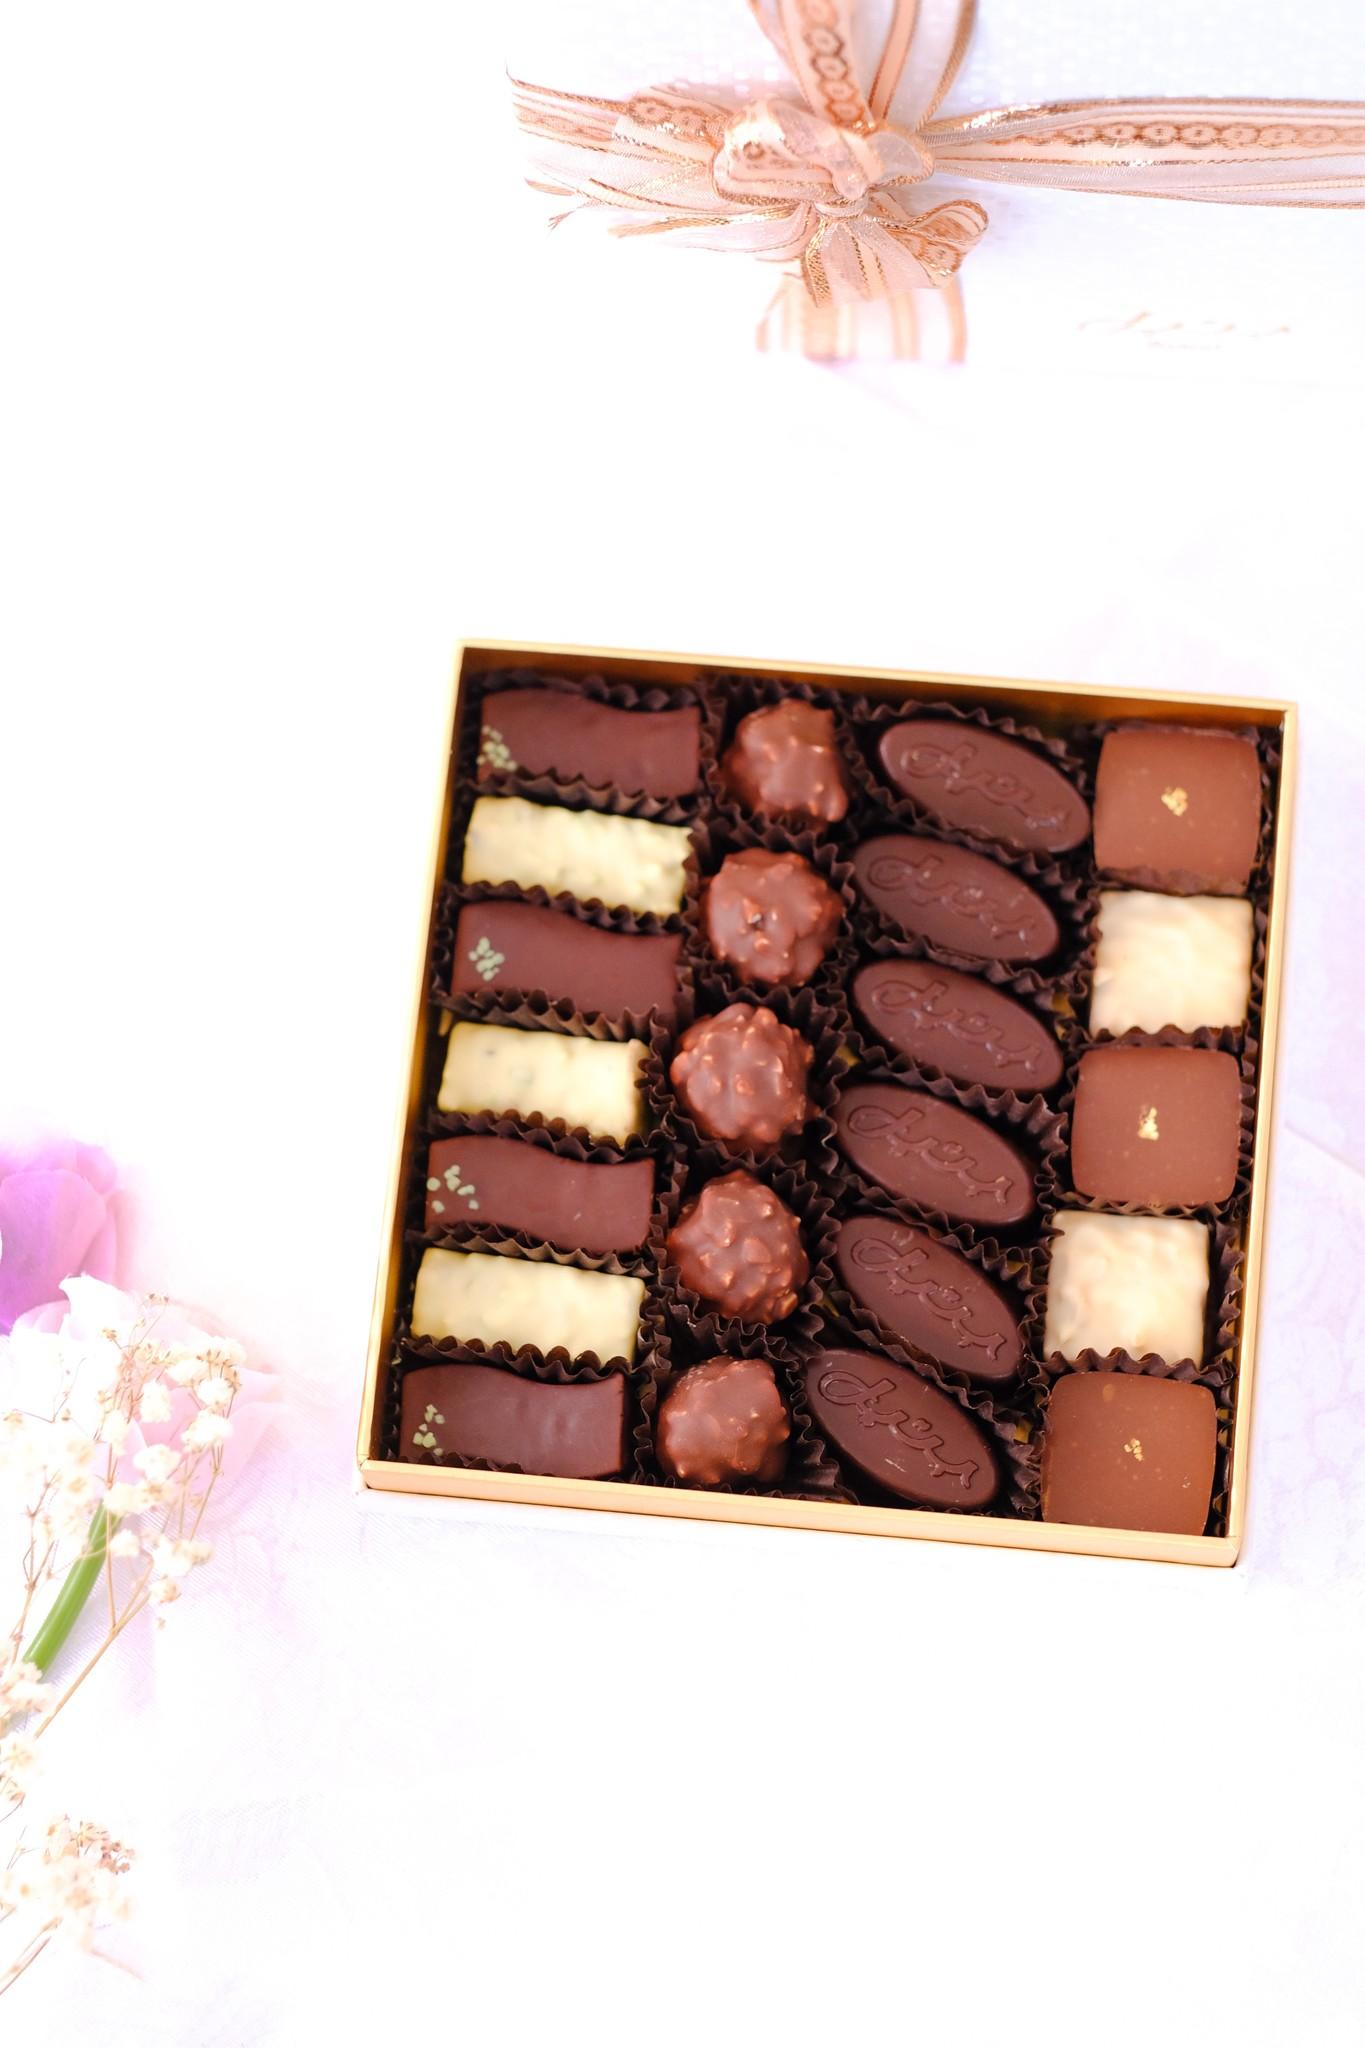 Bateel USA Alaska White Family Boxes M Square Origin Chocolates Assortment